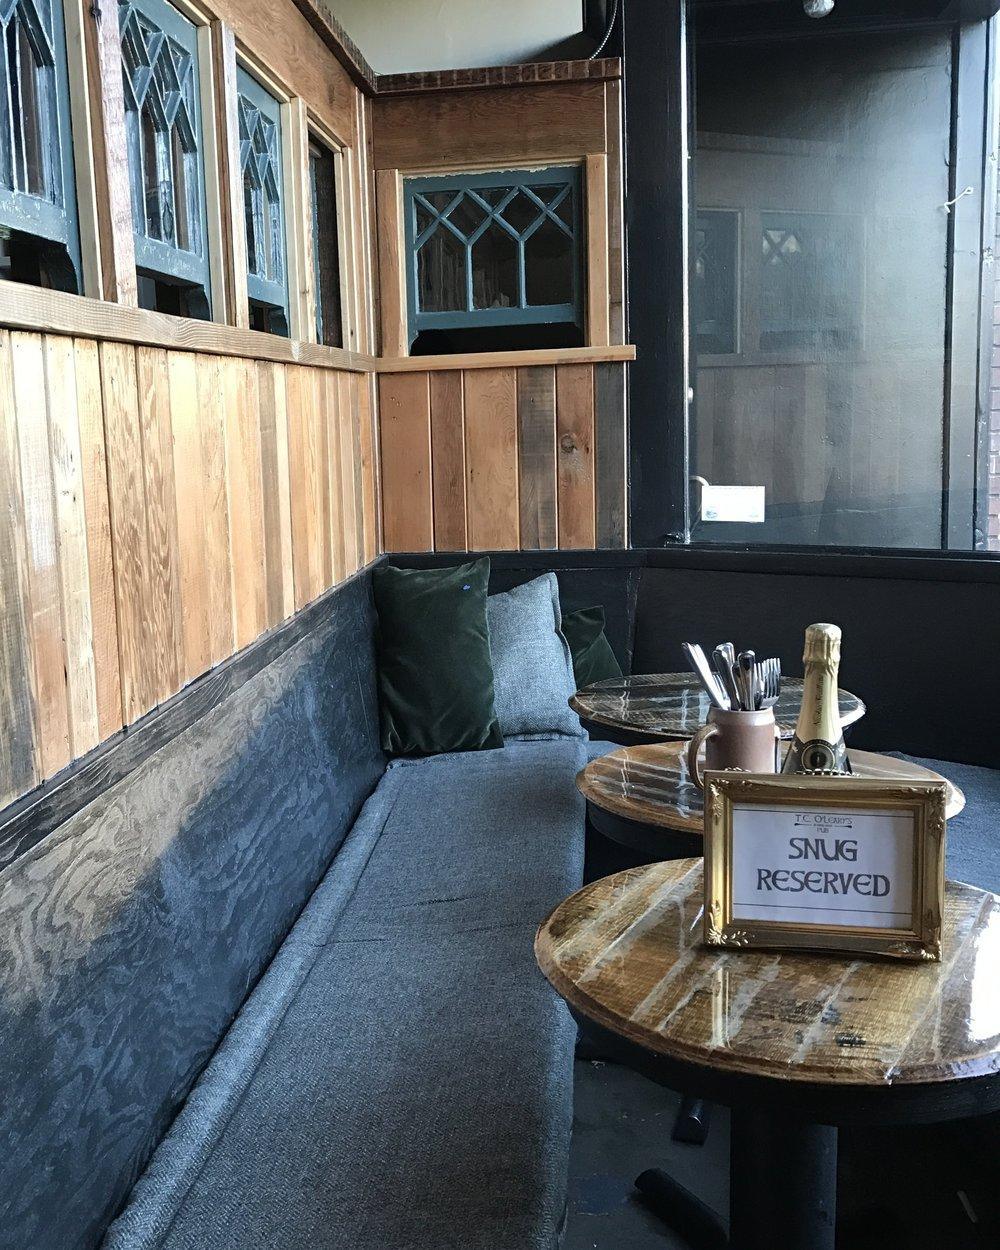 tcolearys tc olearys irish pub snug reservations by cassandra ericson